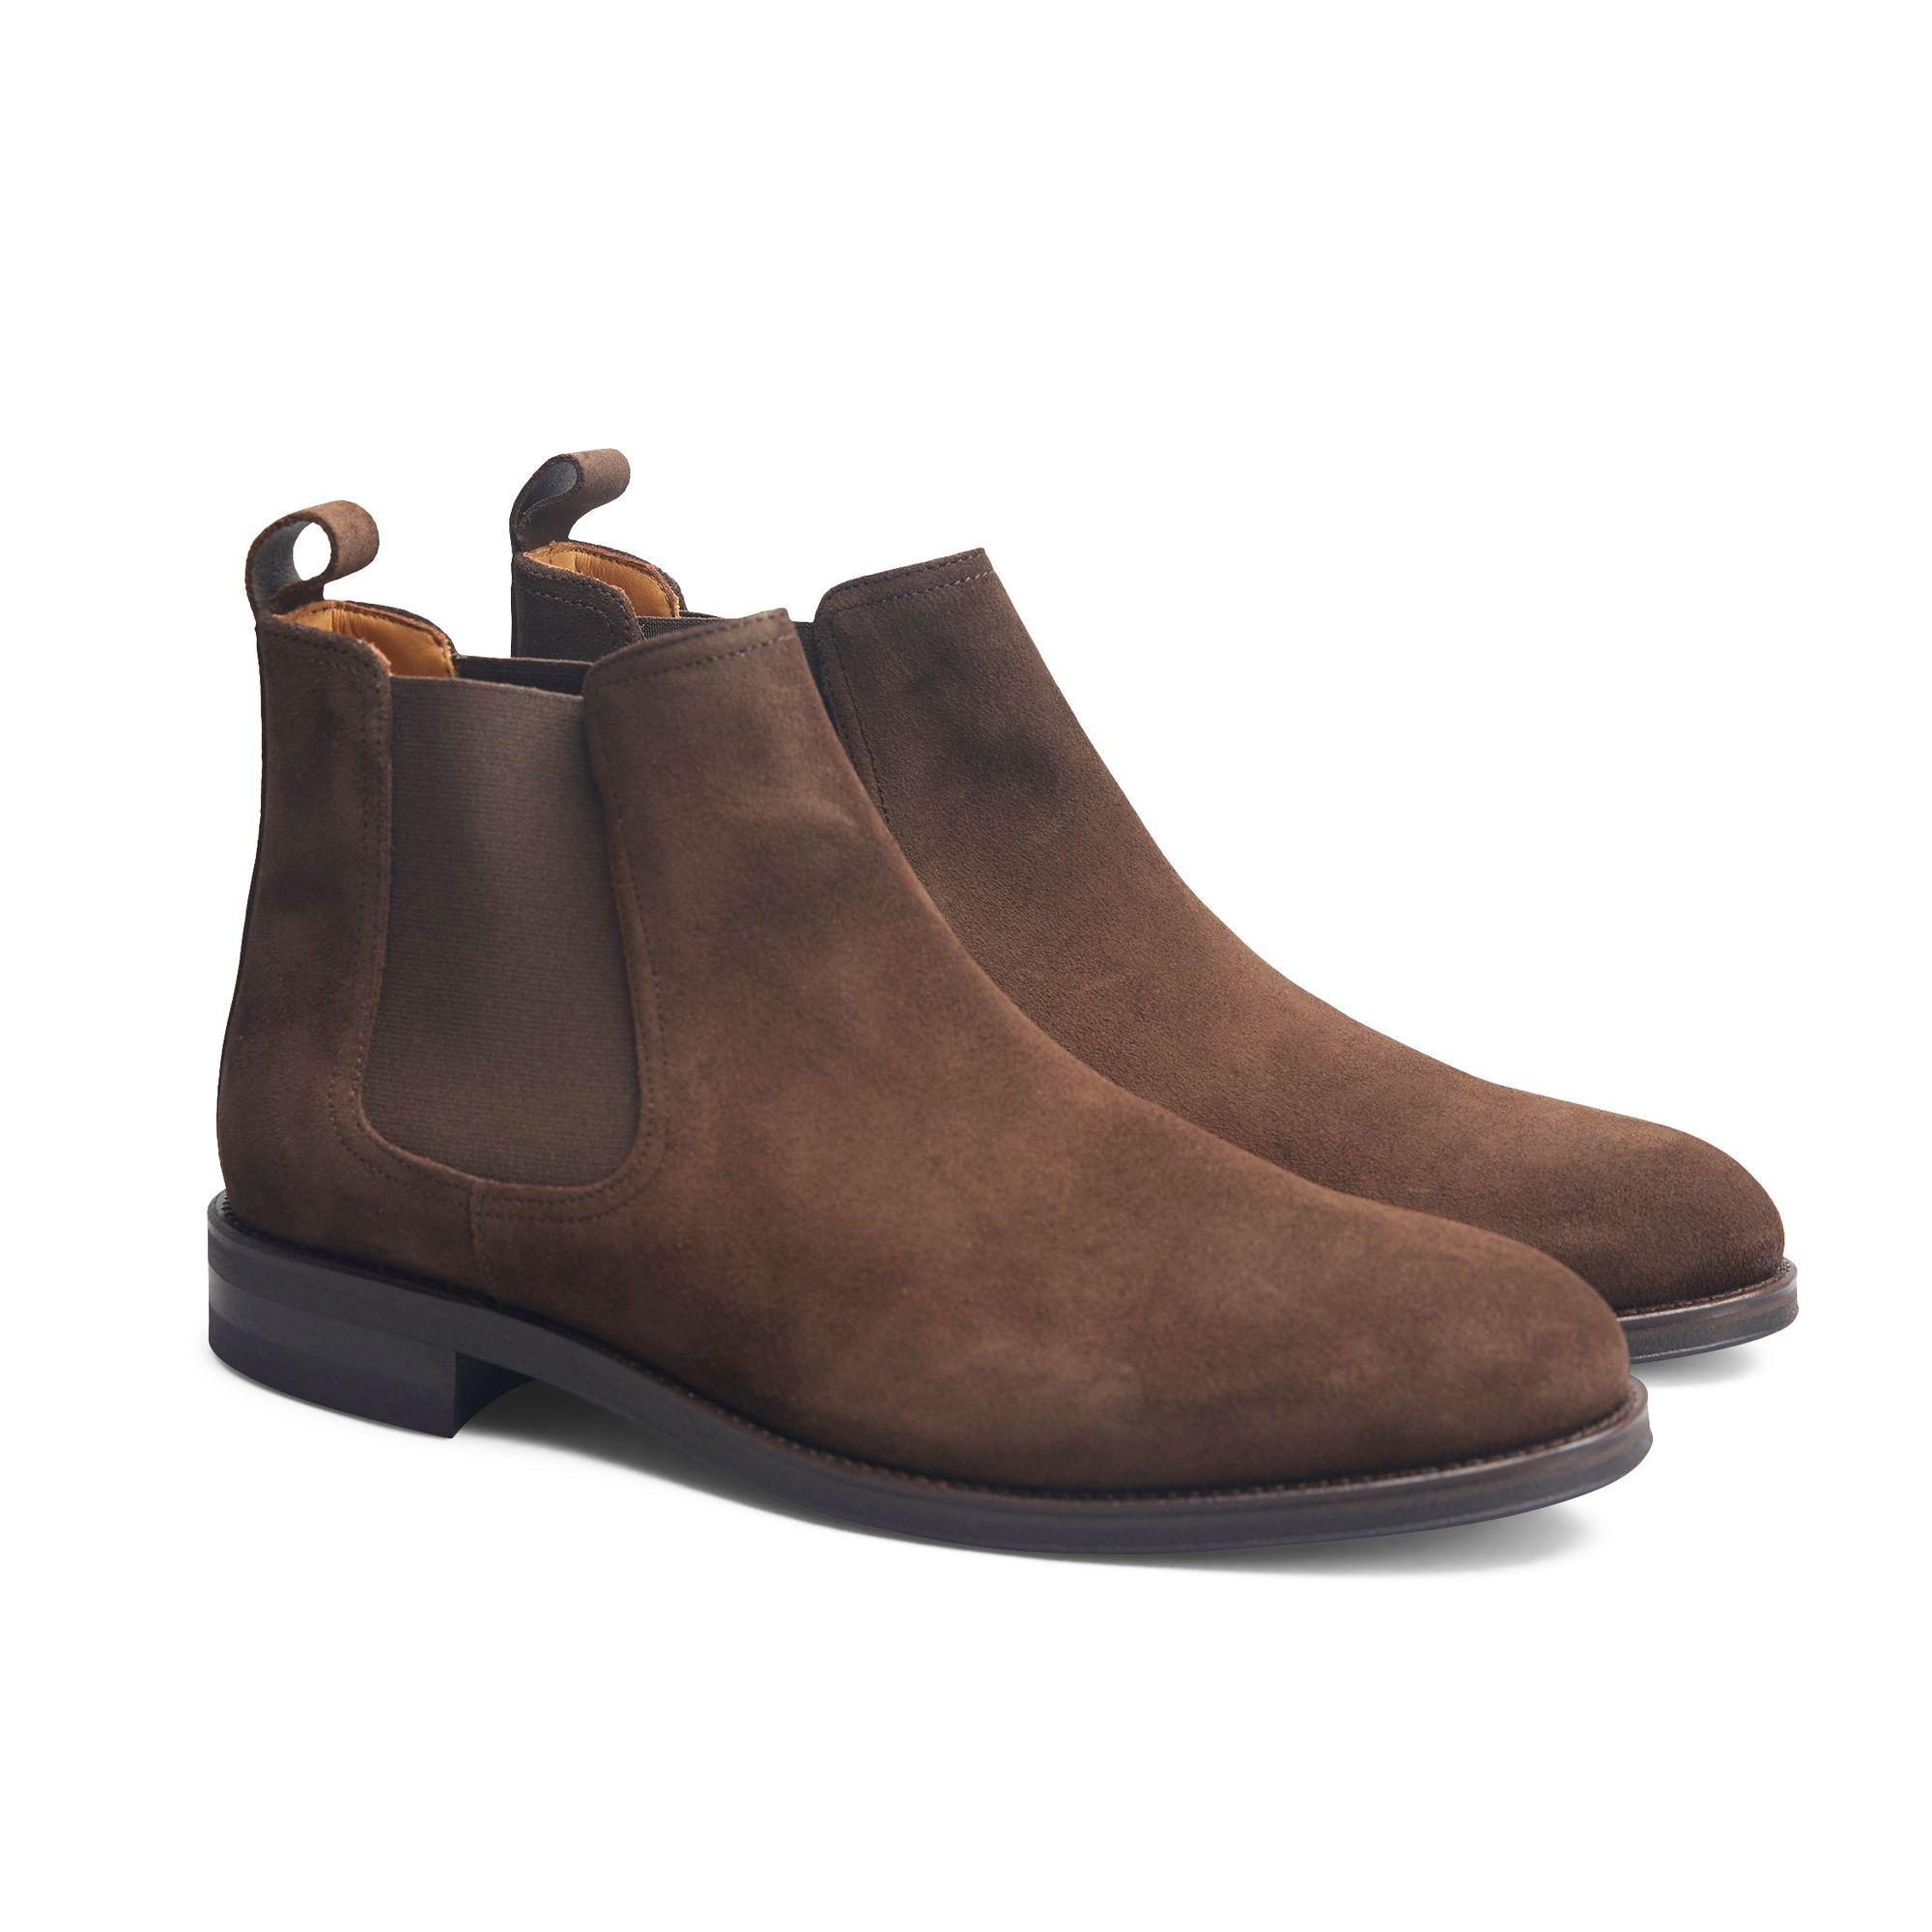 64e3c0a20de Chelsea Boots - Ormskinnsm nstrad finns på PricePi.com.